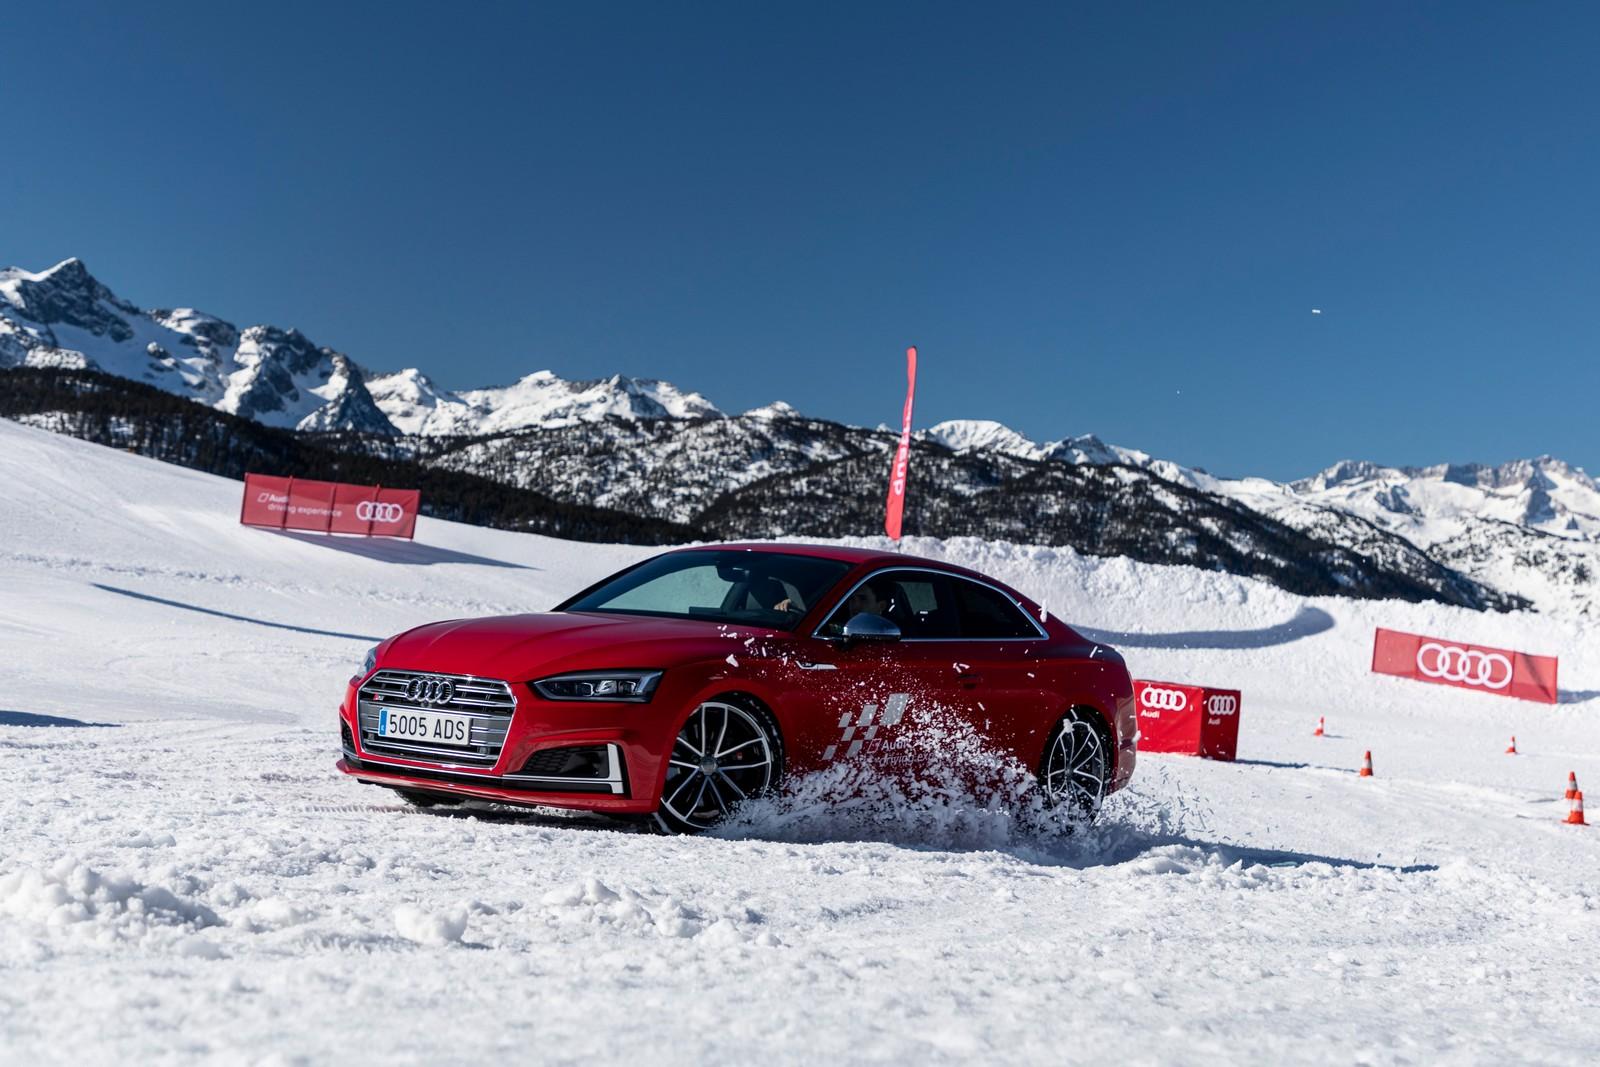 Curso Nieve Audi 2020 05